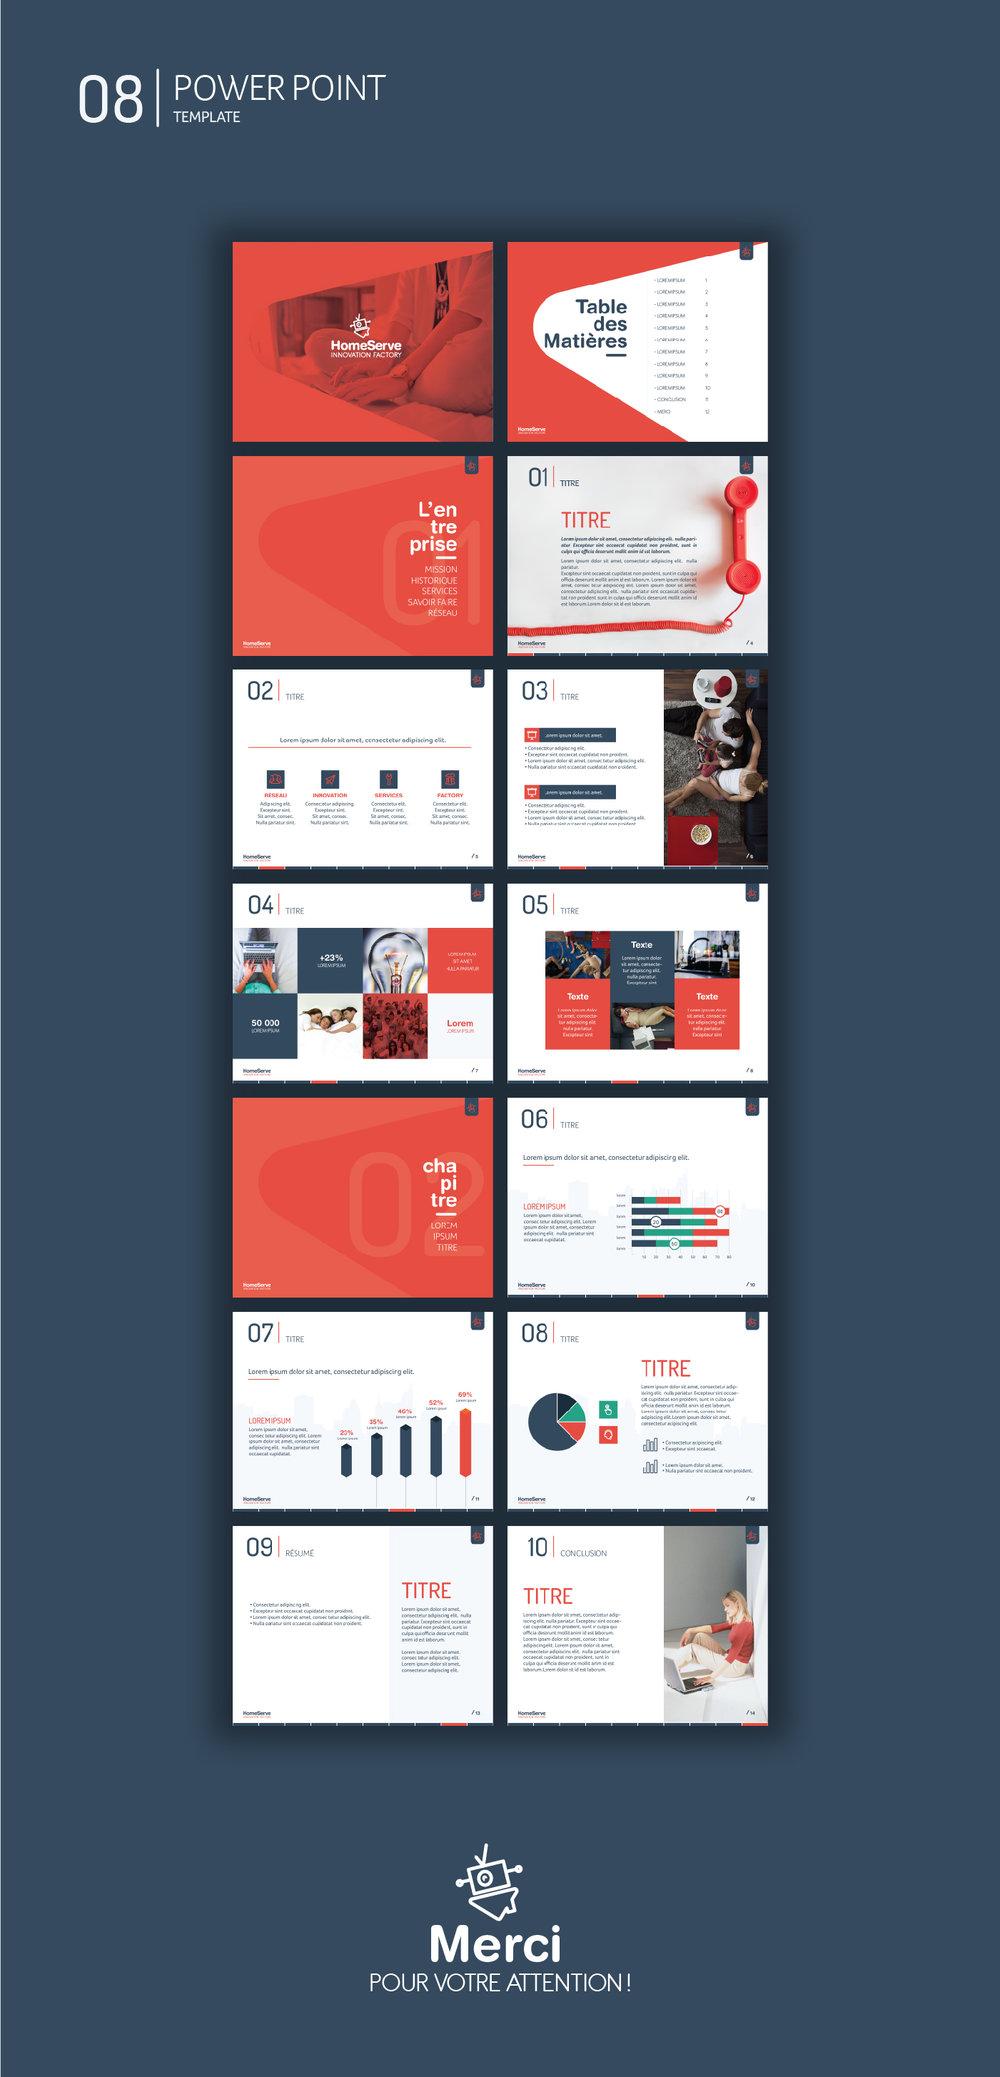 4-homeserve-innovation-factory-assurance_design_graphique_powerpoint-presentation.jpg